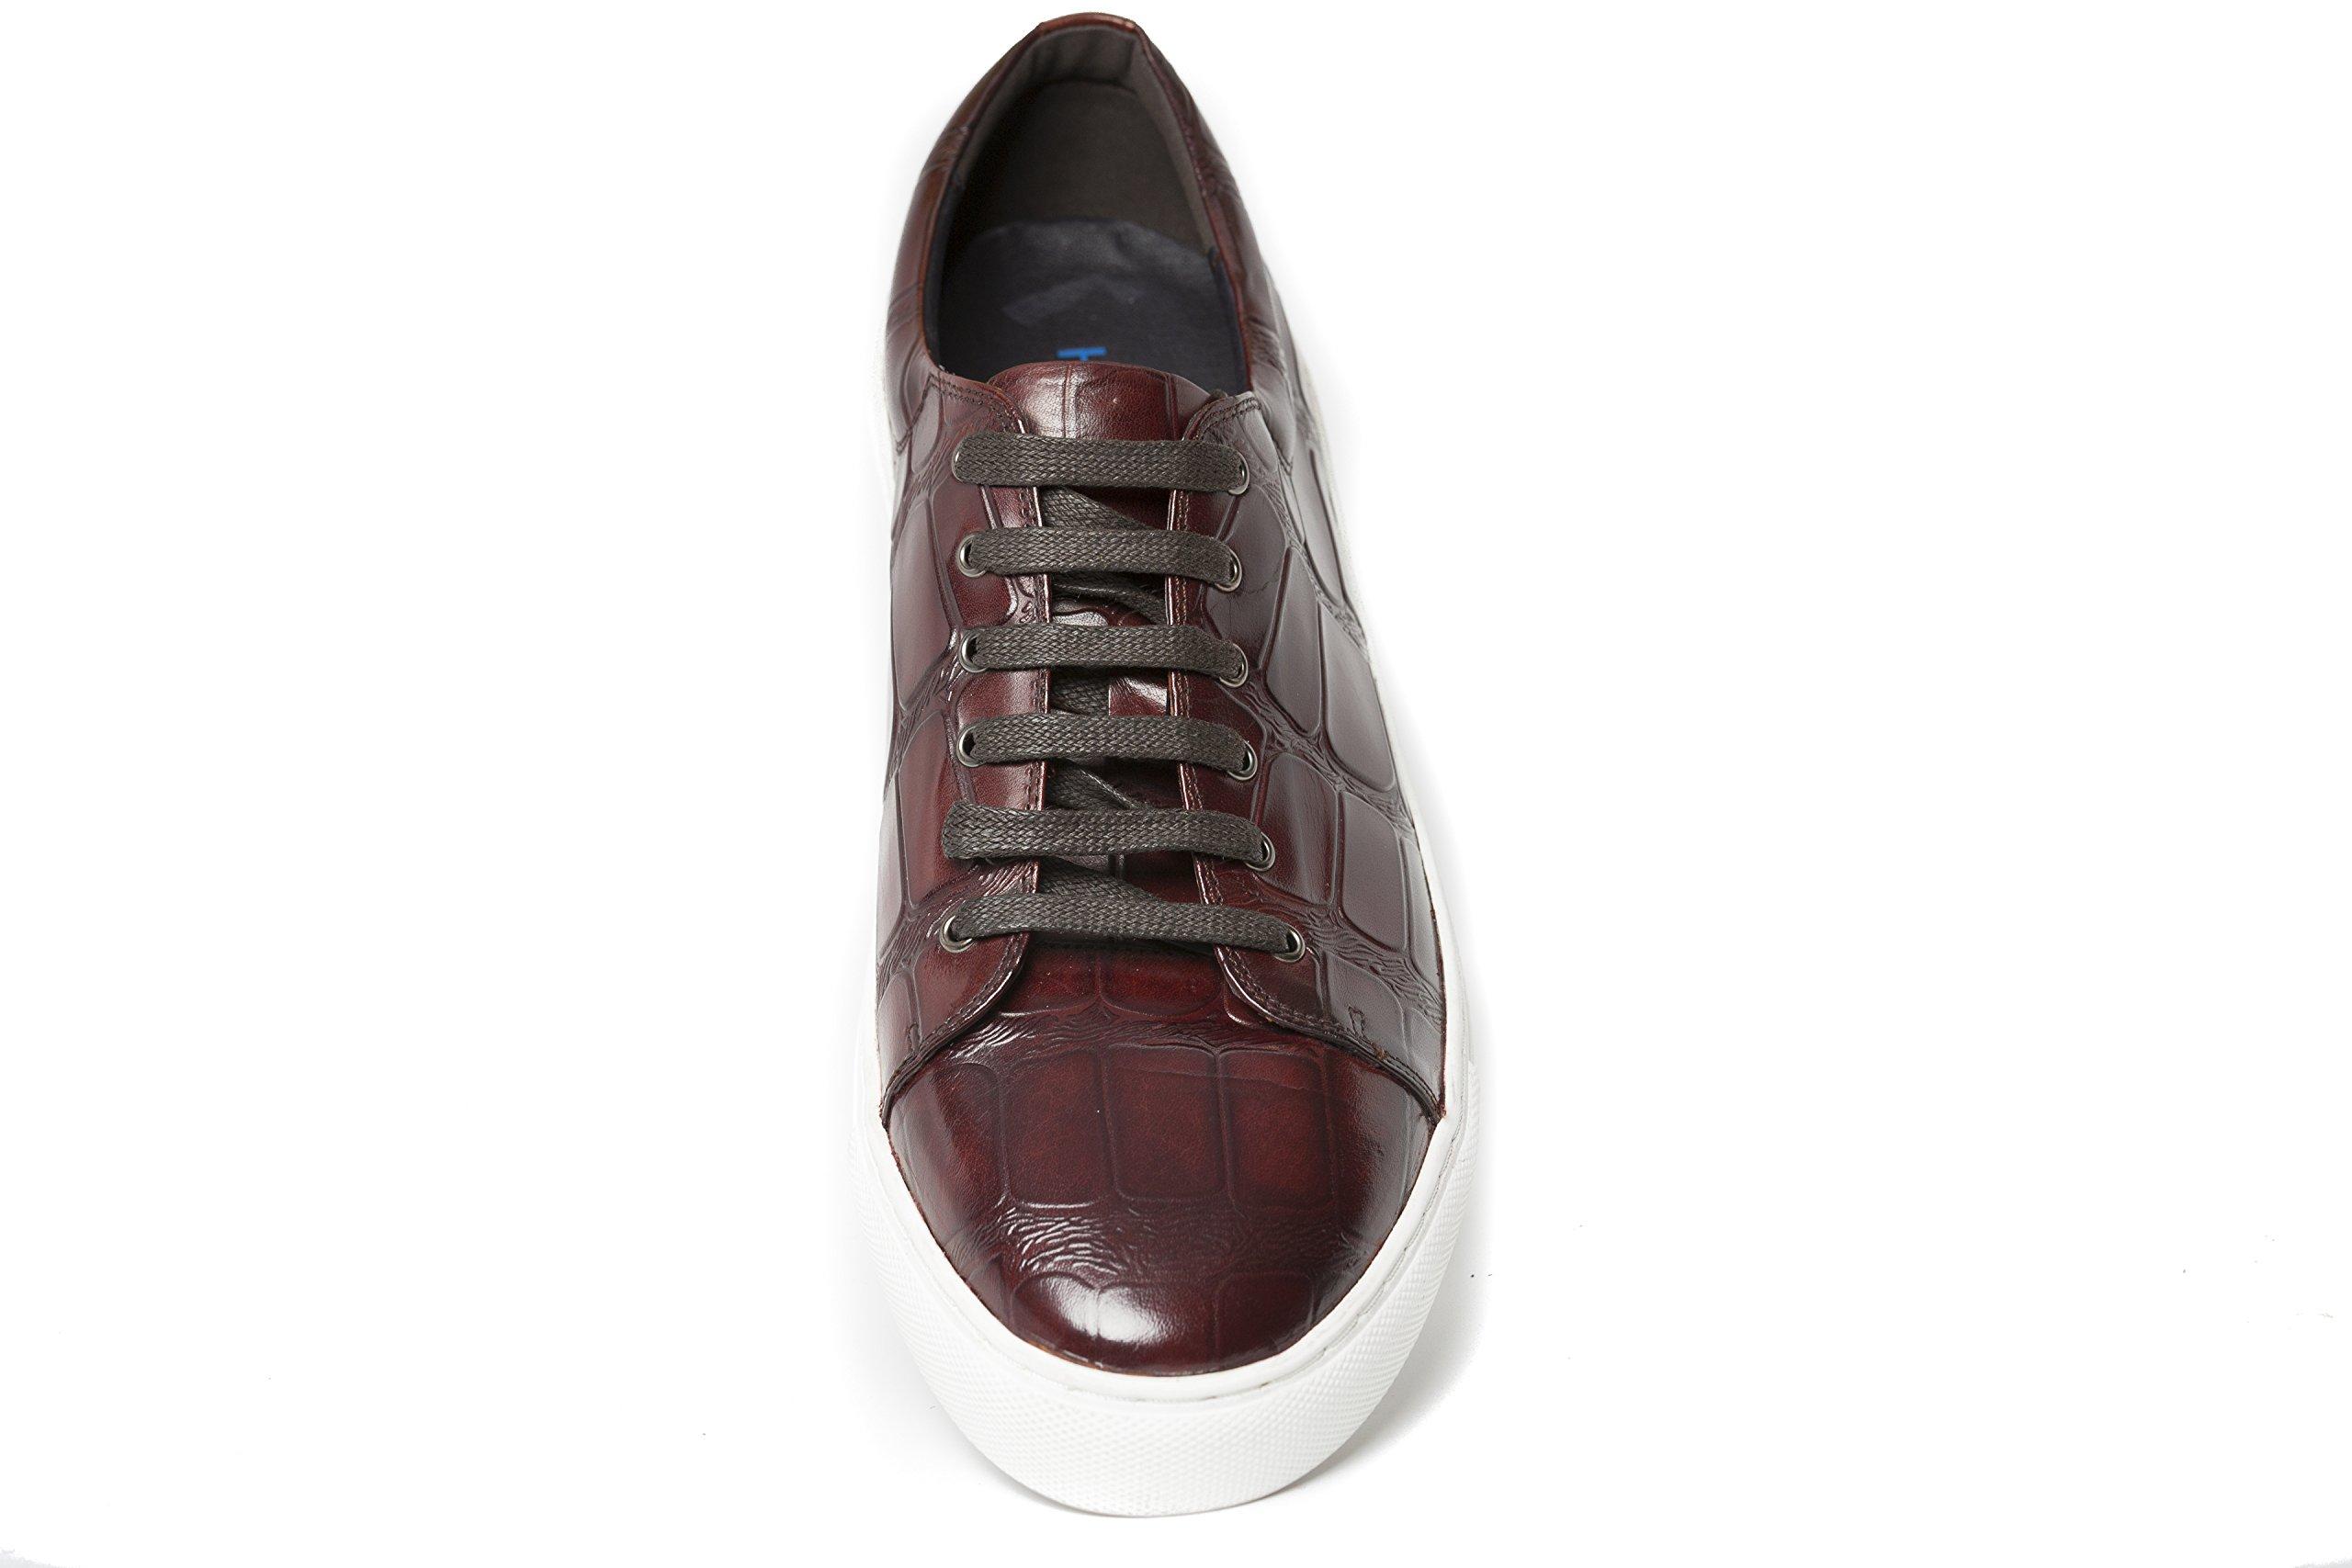 Cephus (Liam Michael Family of Shoes)